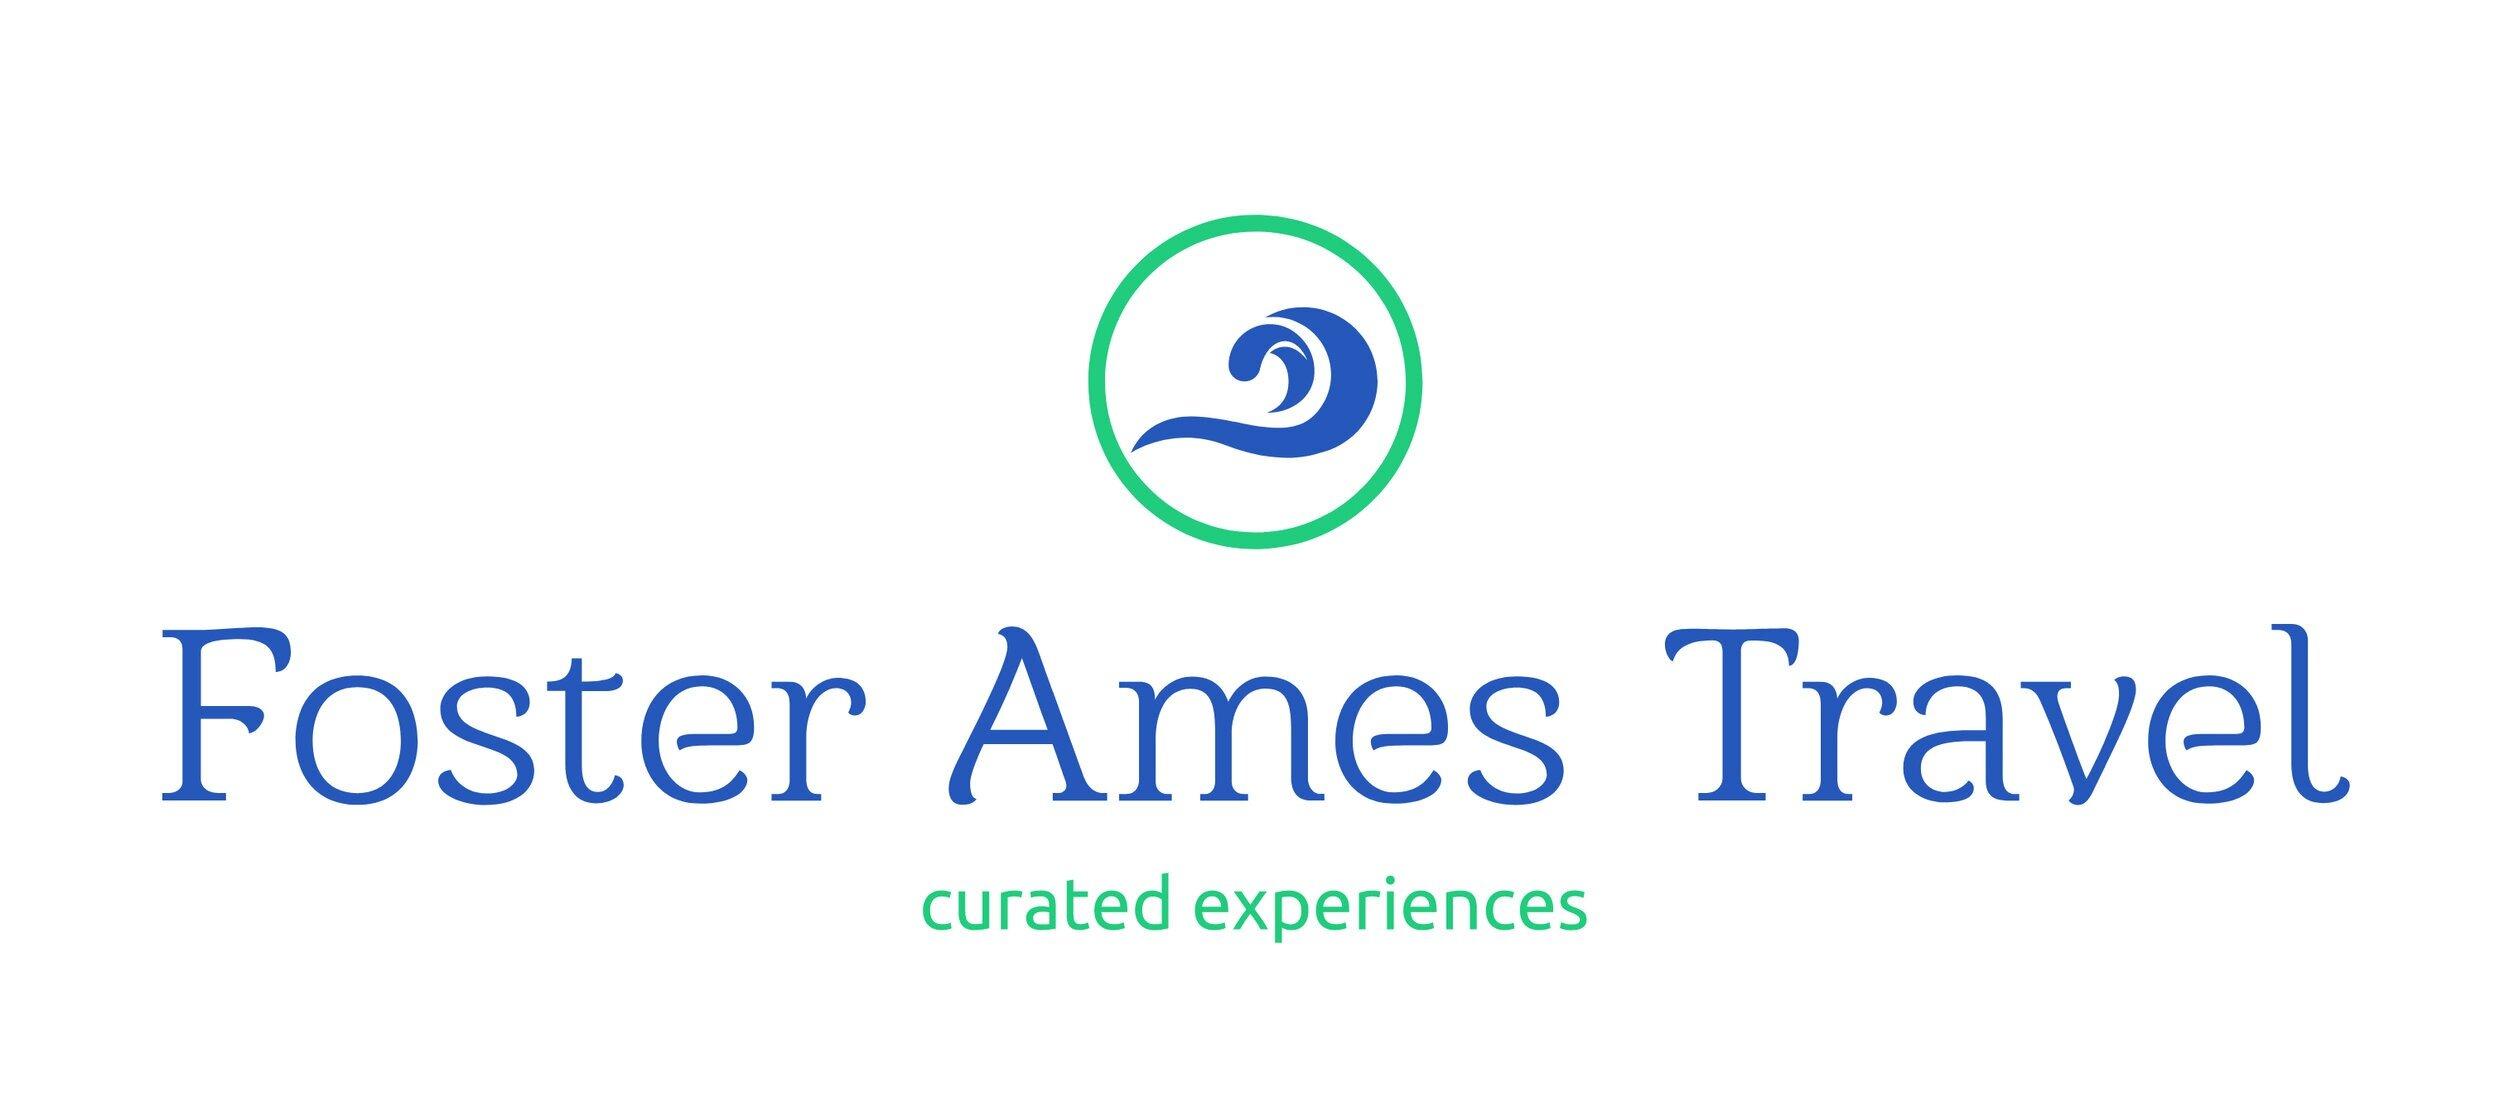 Foster Ames Travel Logo.jpg